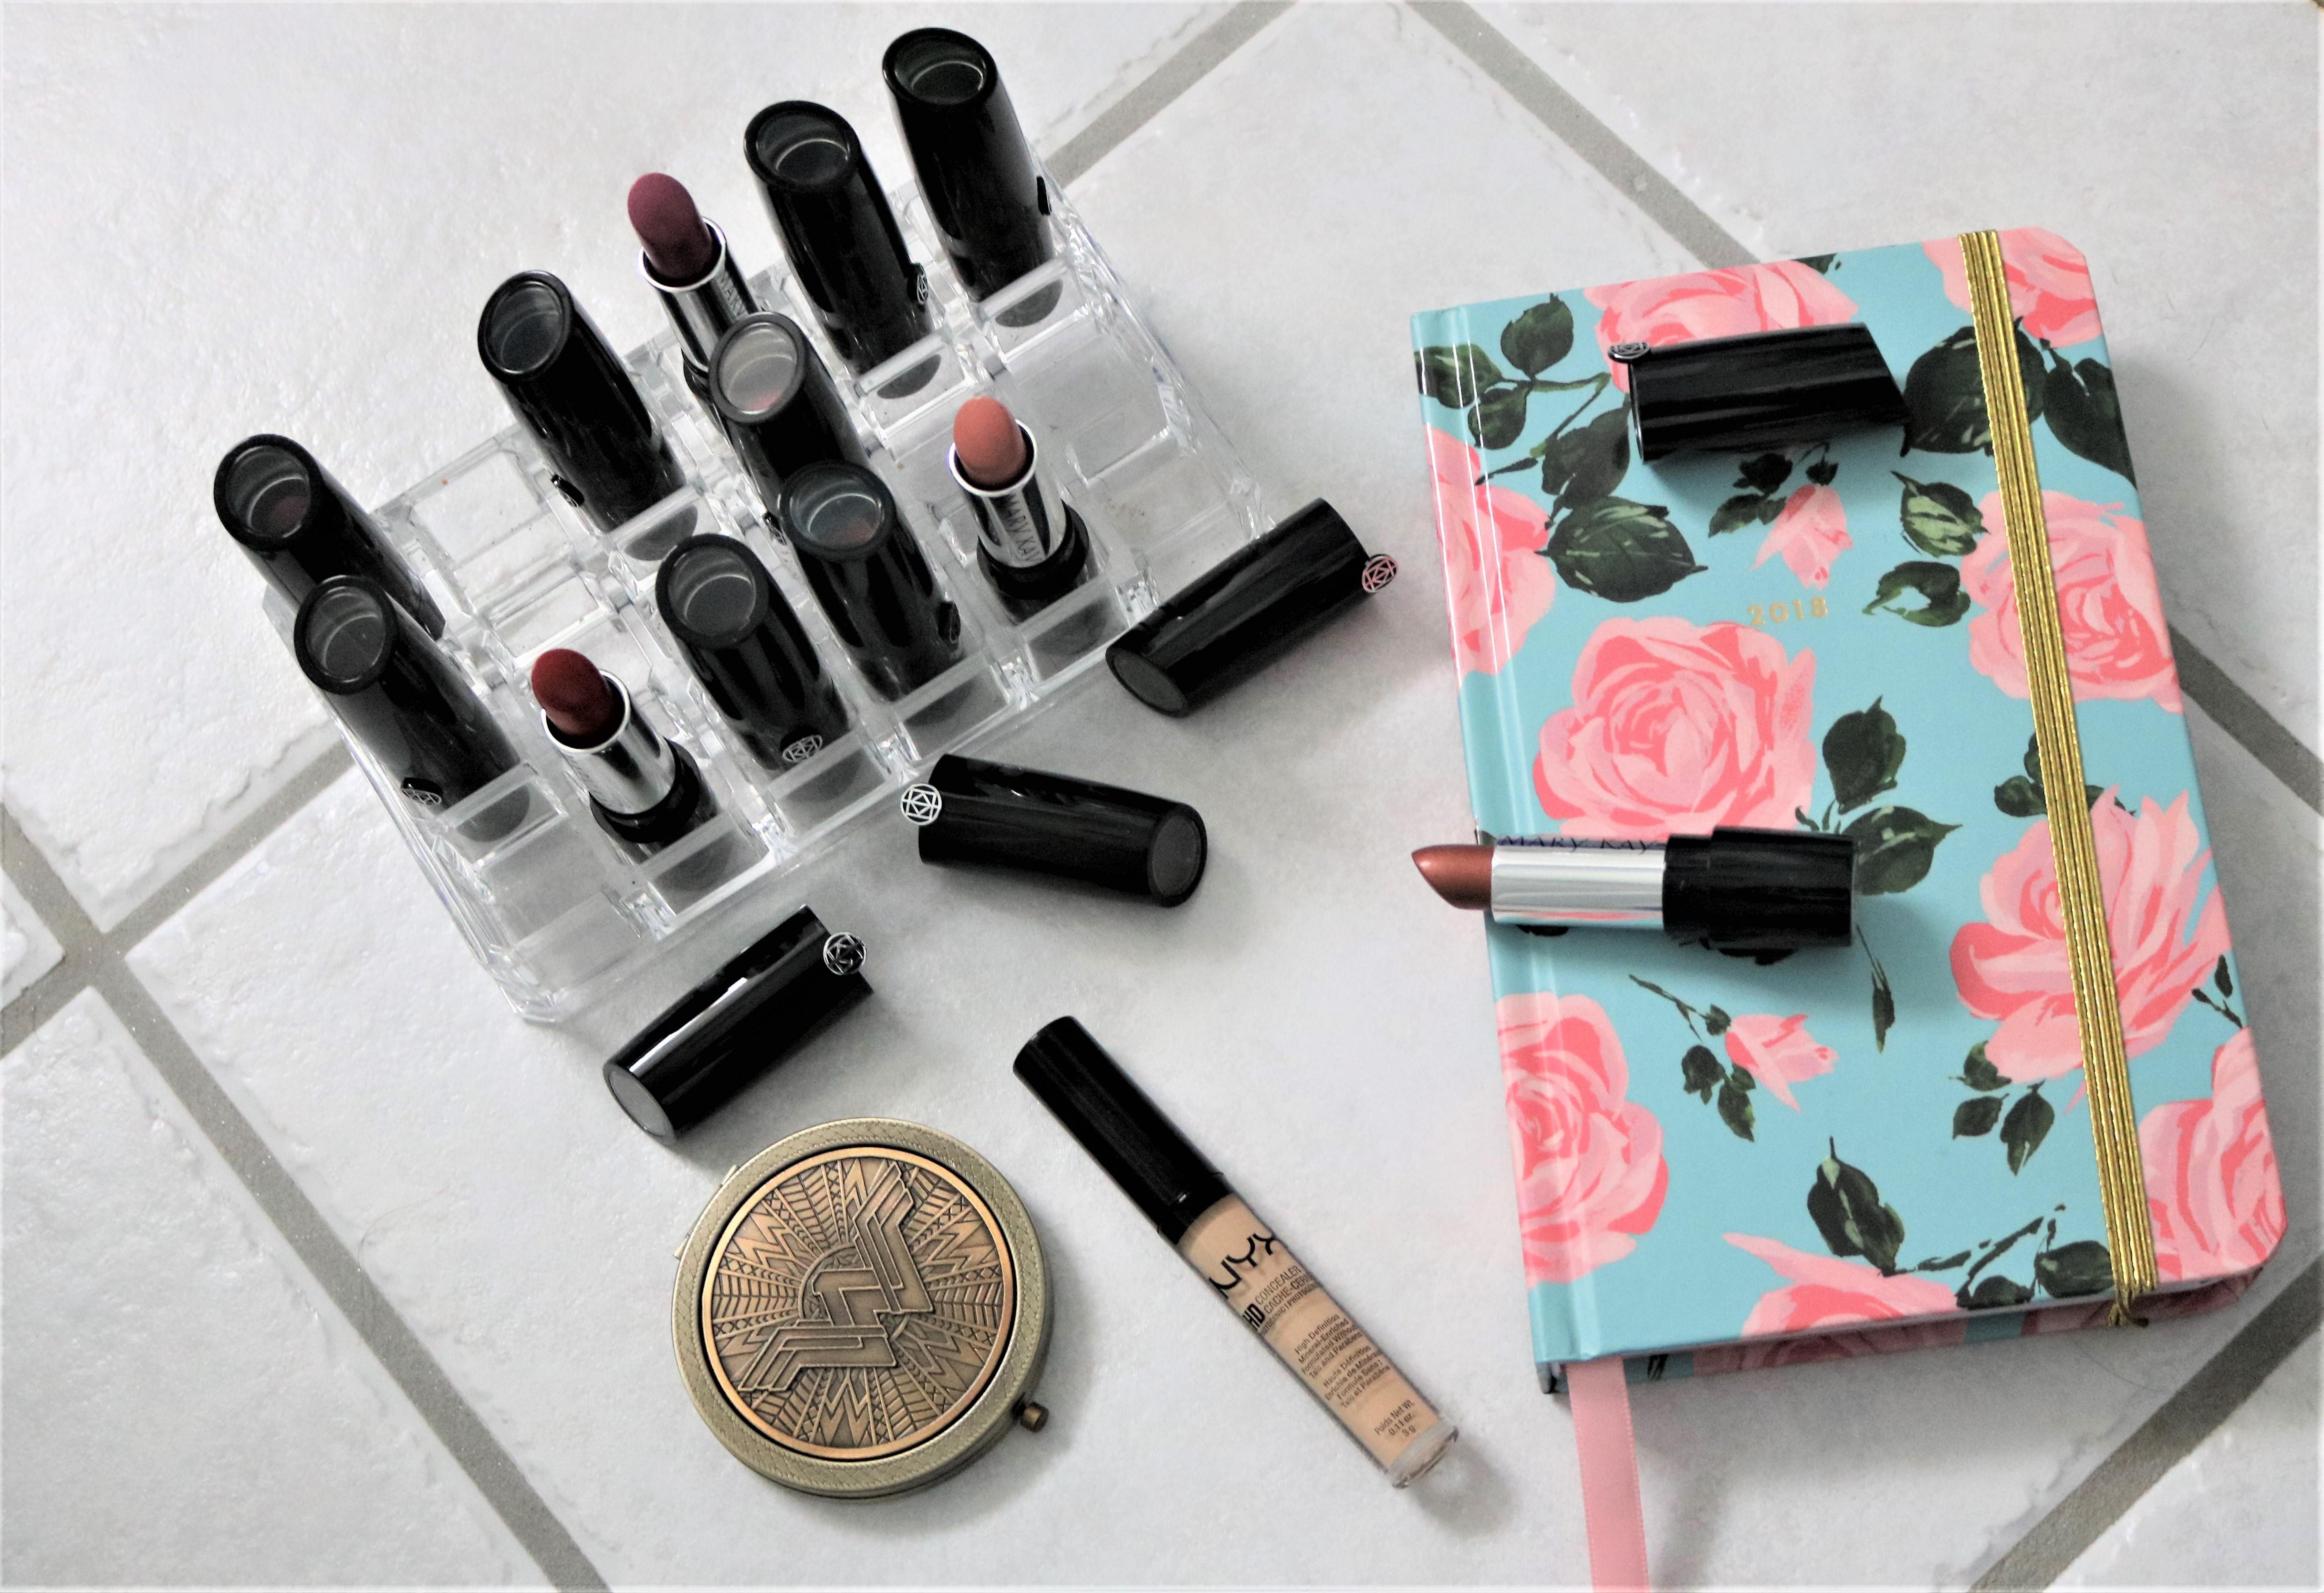 Review: Mary Kay Gel Semi-Shine Lipsticks - I\'m Not a Beauty Guru